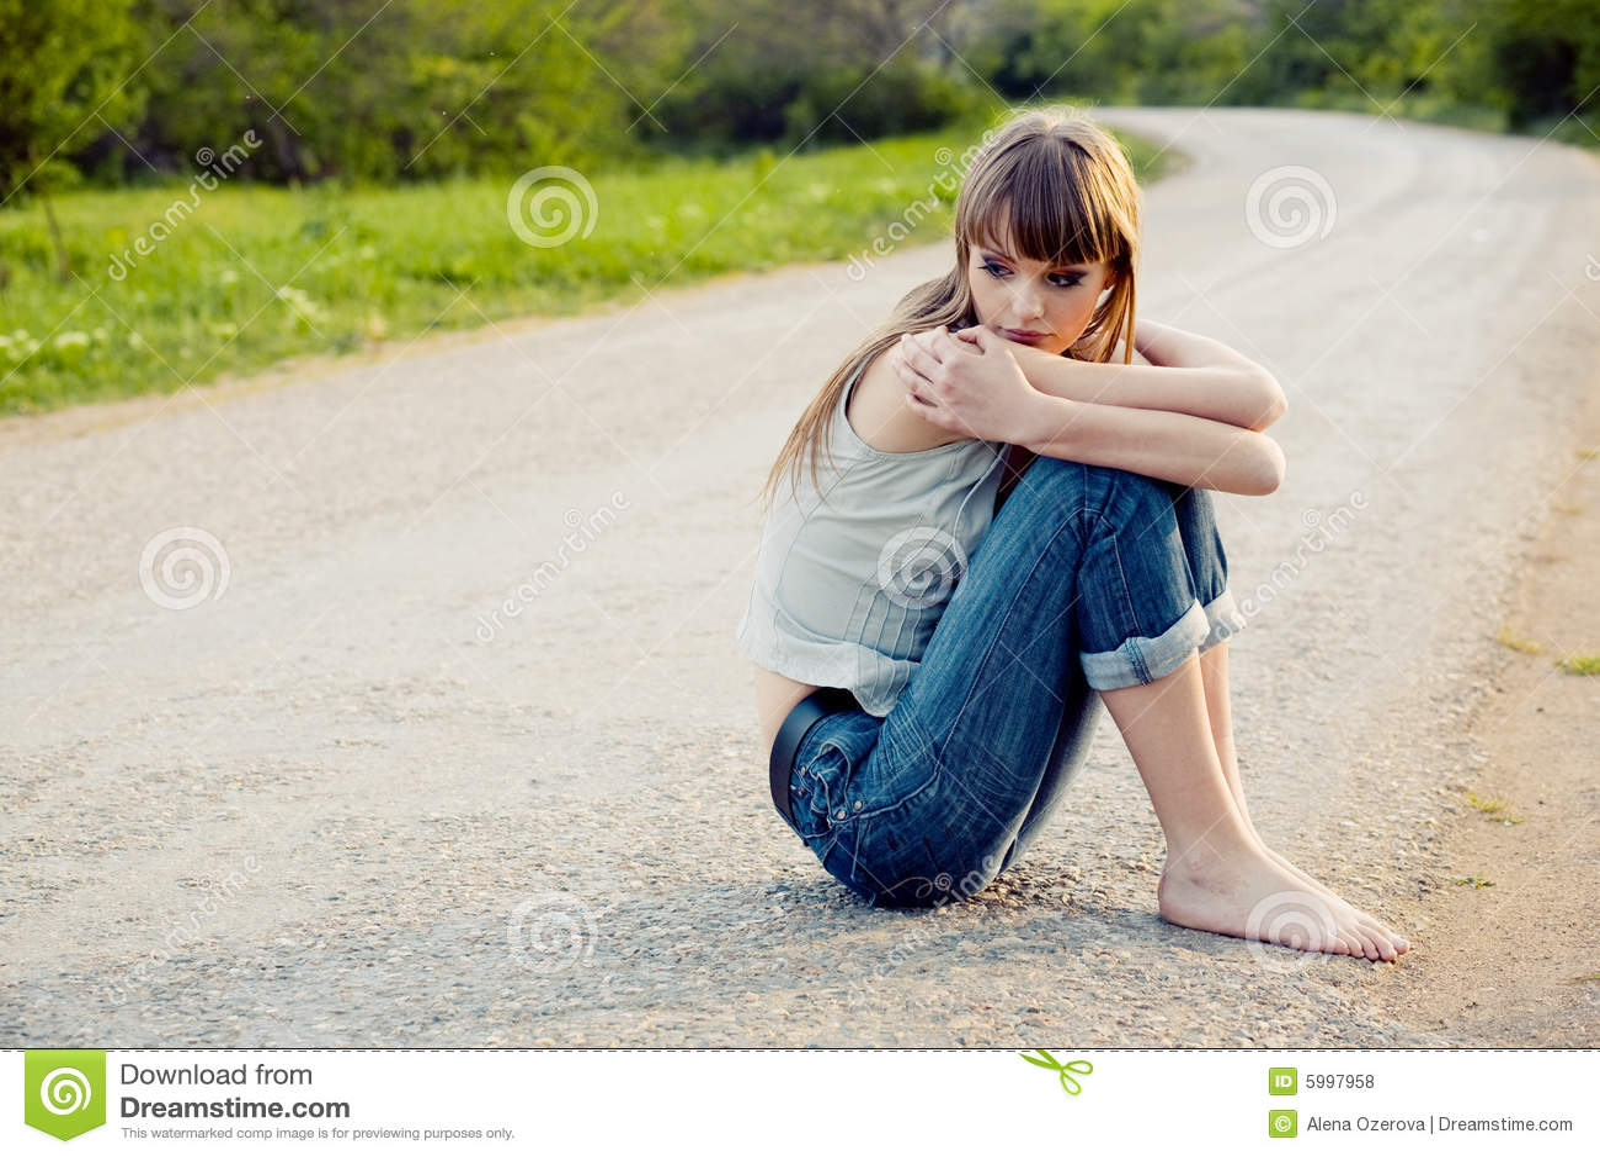 Teenager Girl Sitting On Road Stock Photo - Image: 5997958